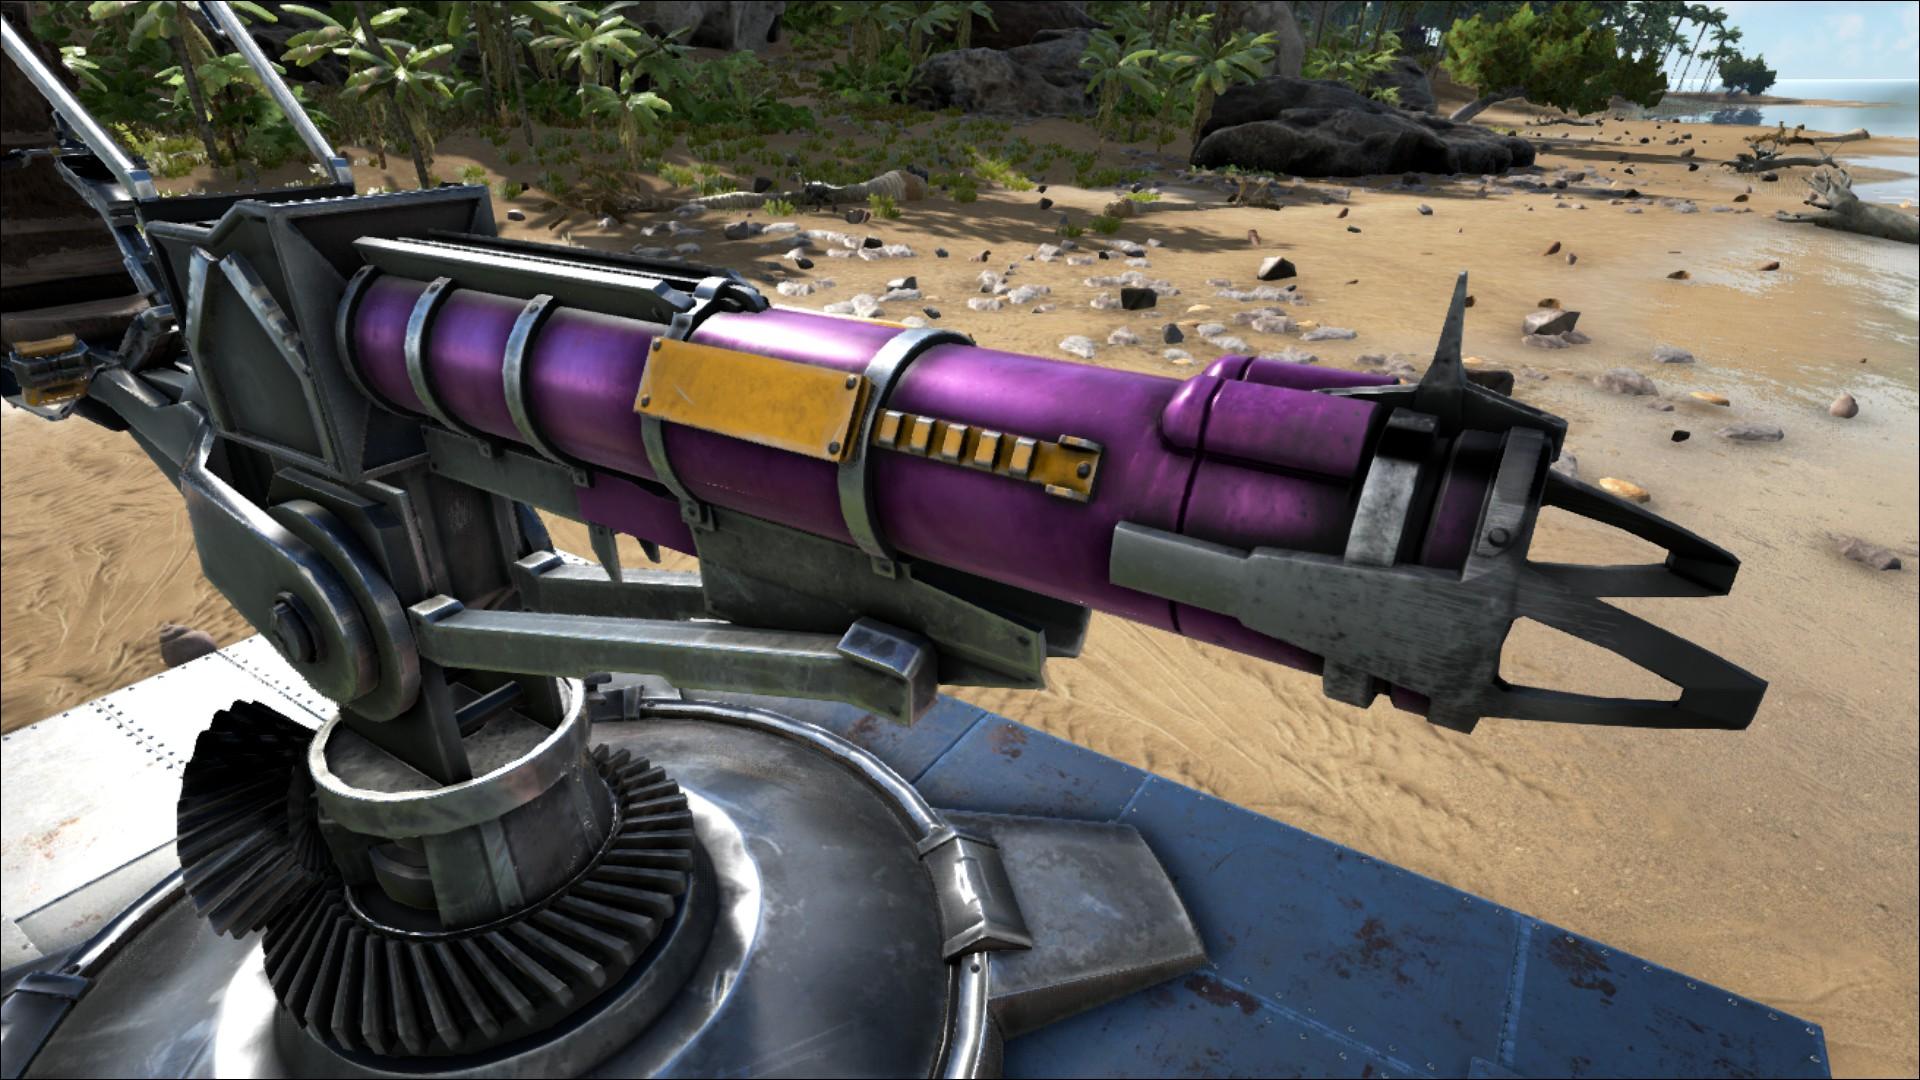 100 ark blueprint list steam community guide how to summon ark blueprint list rocket turret official ark survival evolved wiki malvernweather Gallery